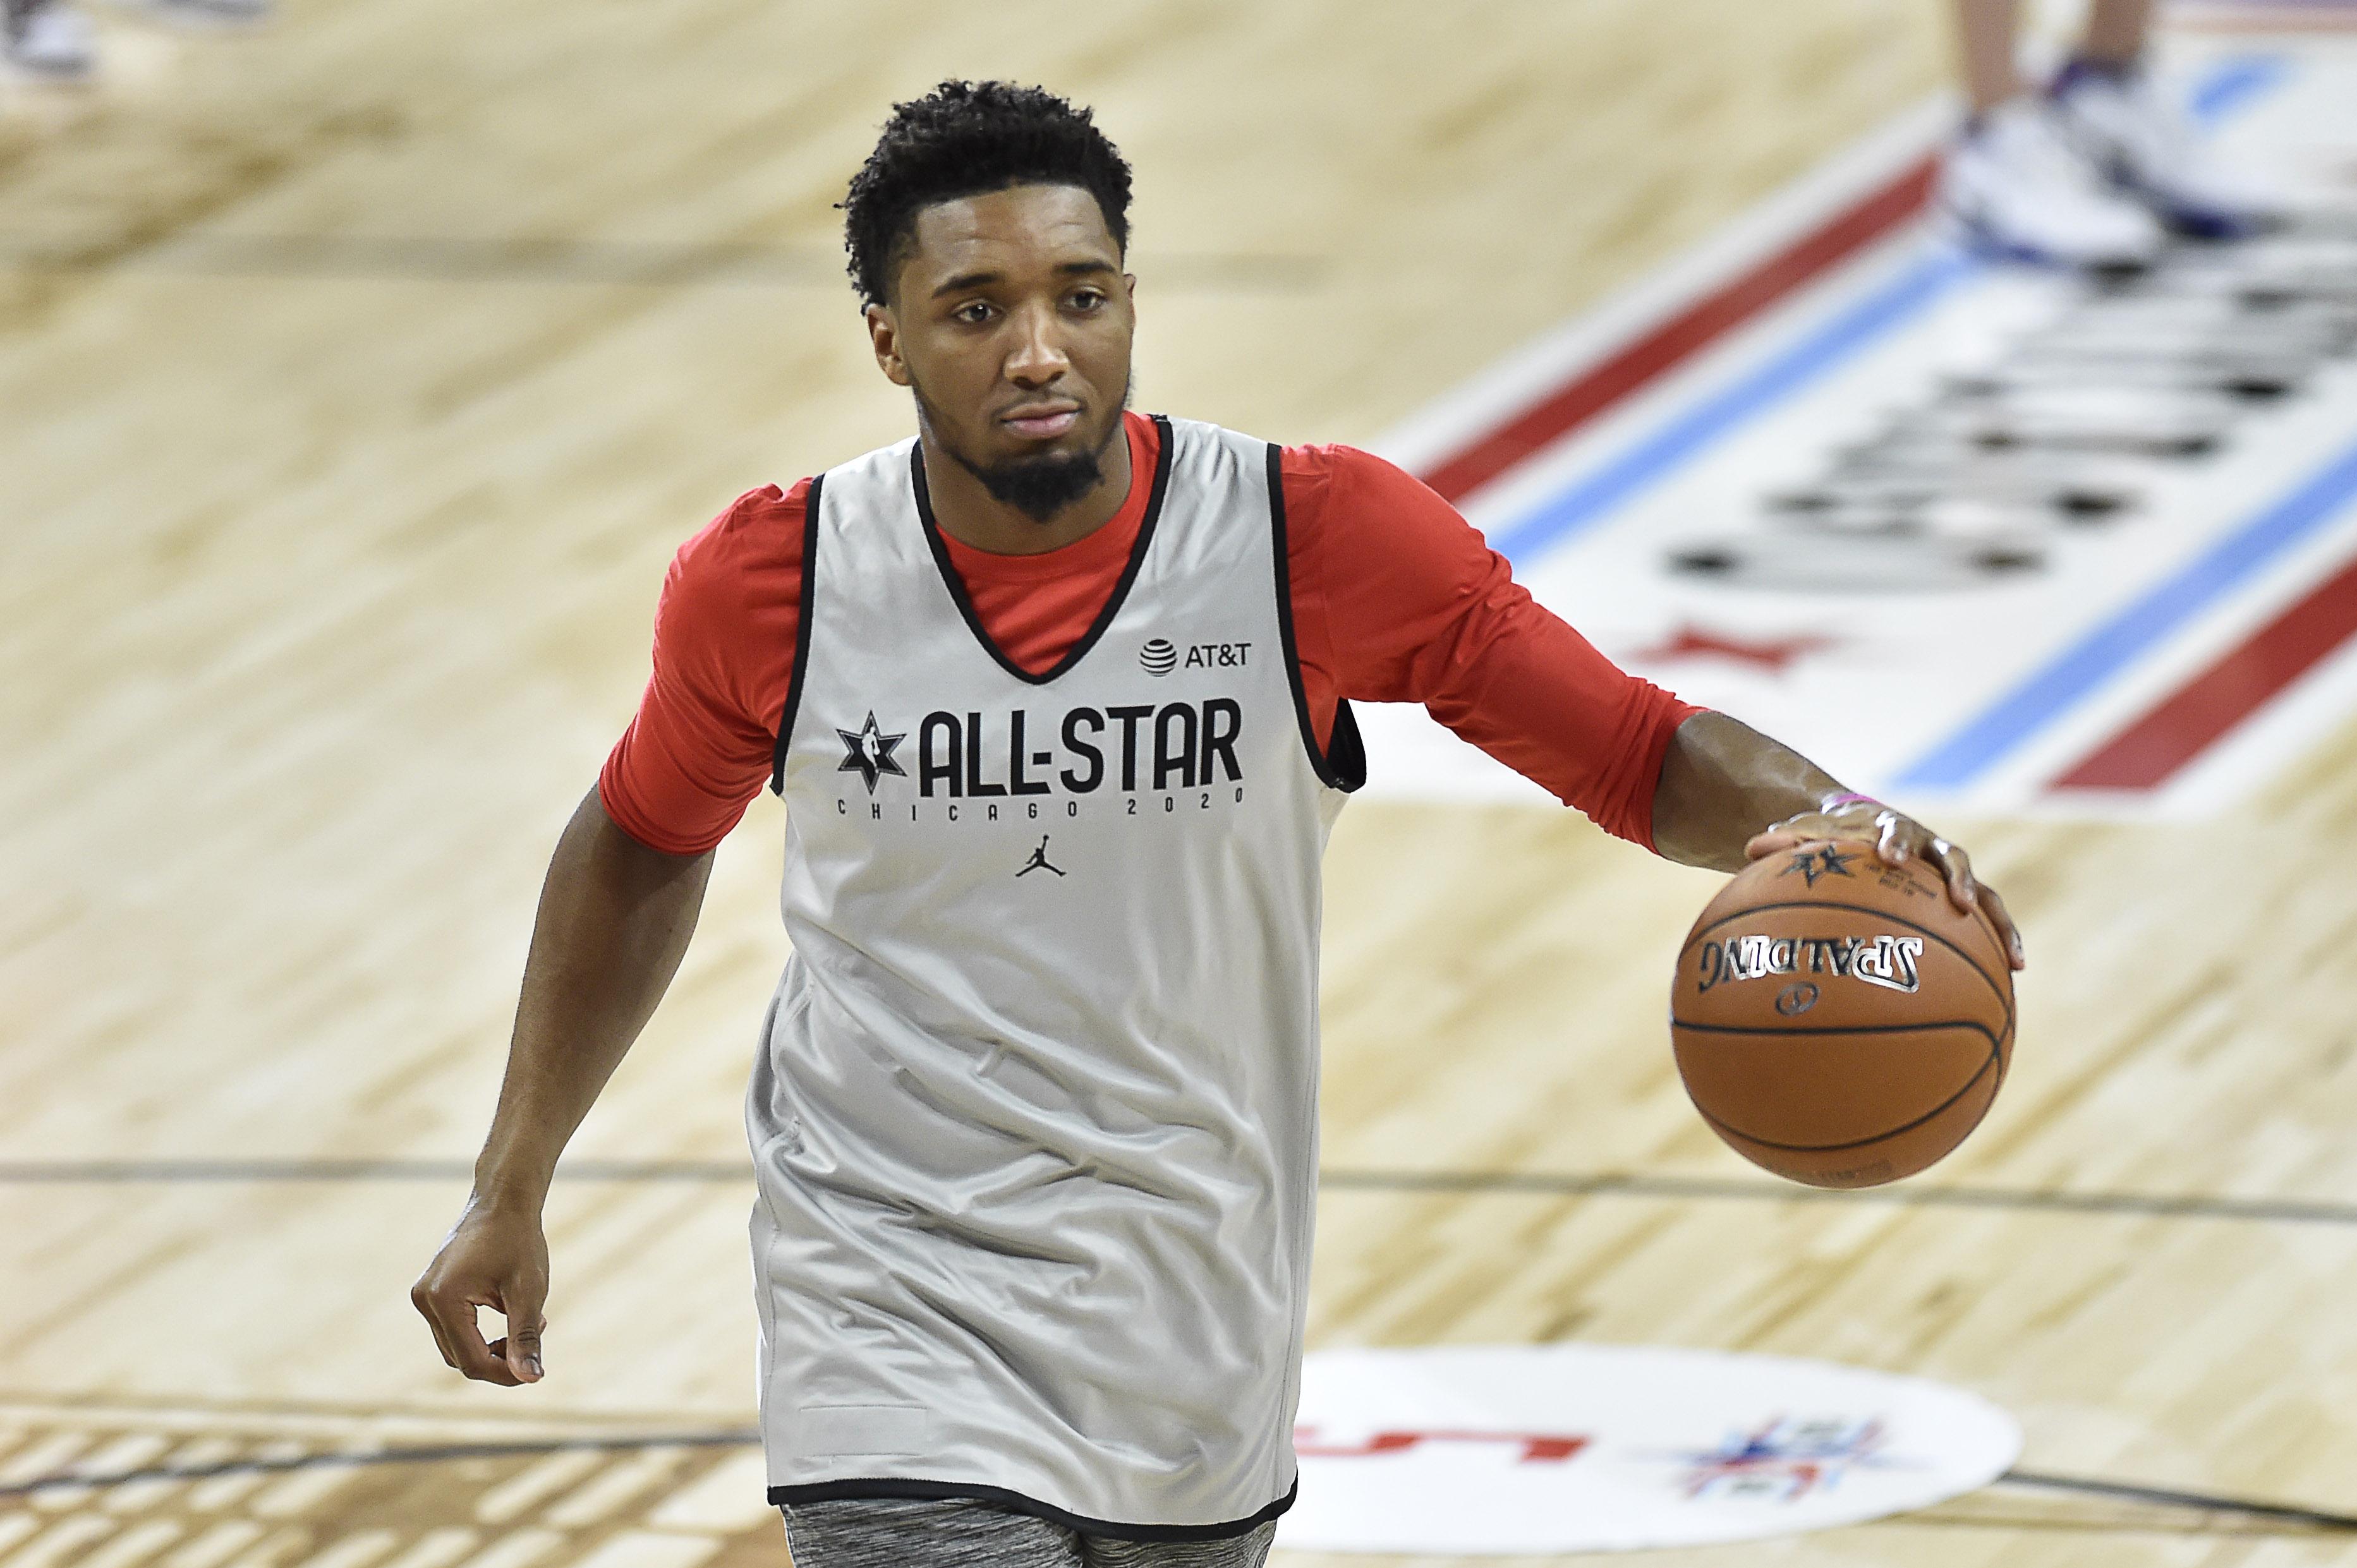 NBA: All Star-Media Day